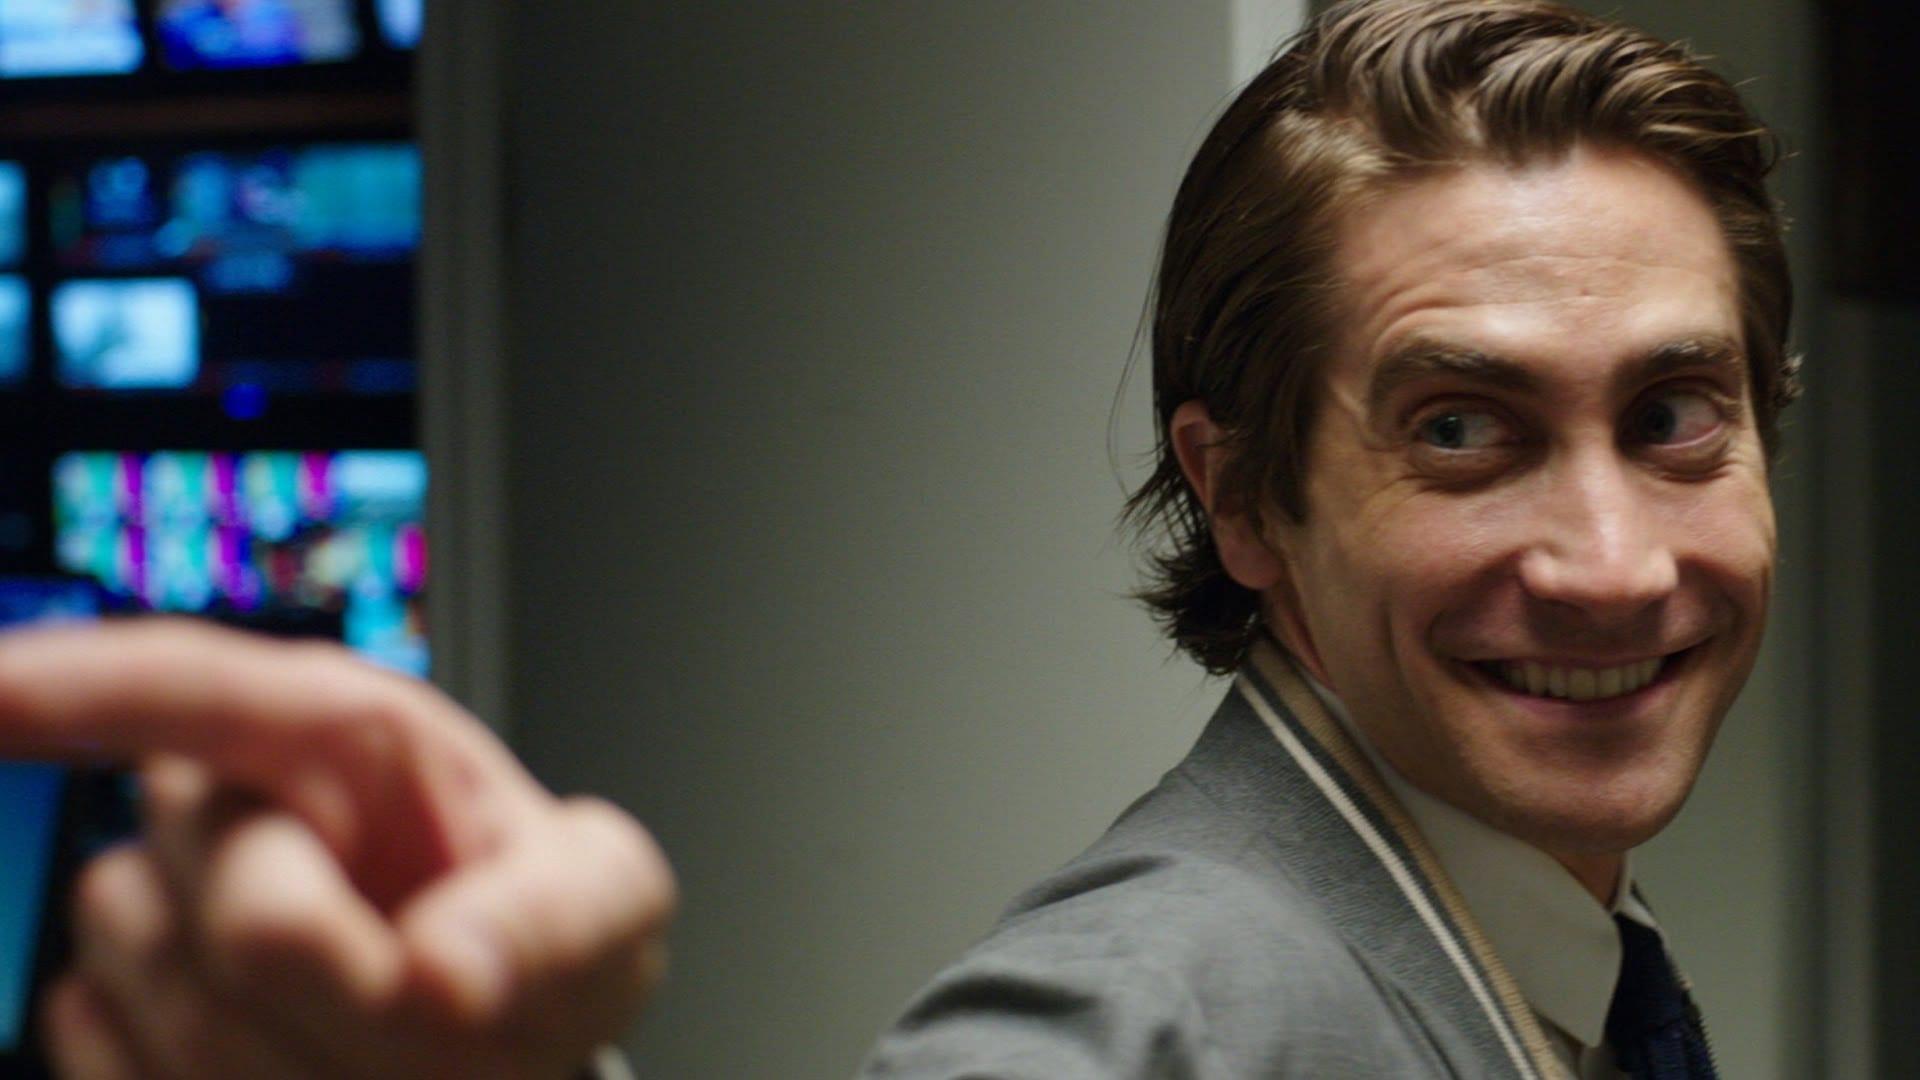 Defining Moments: Jake Gyllenhaal